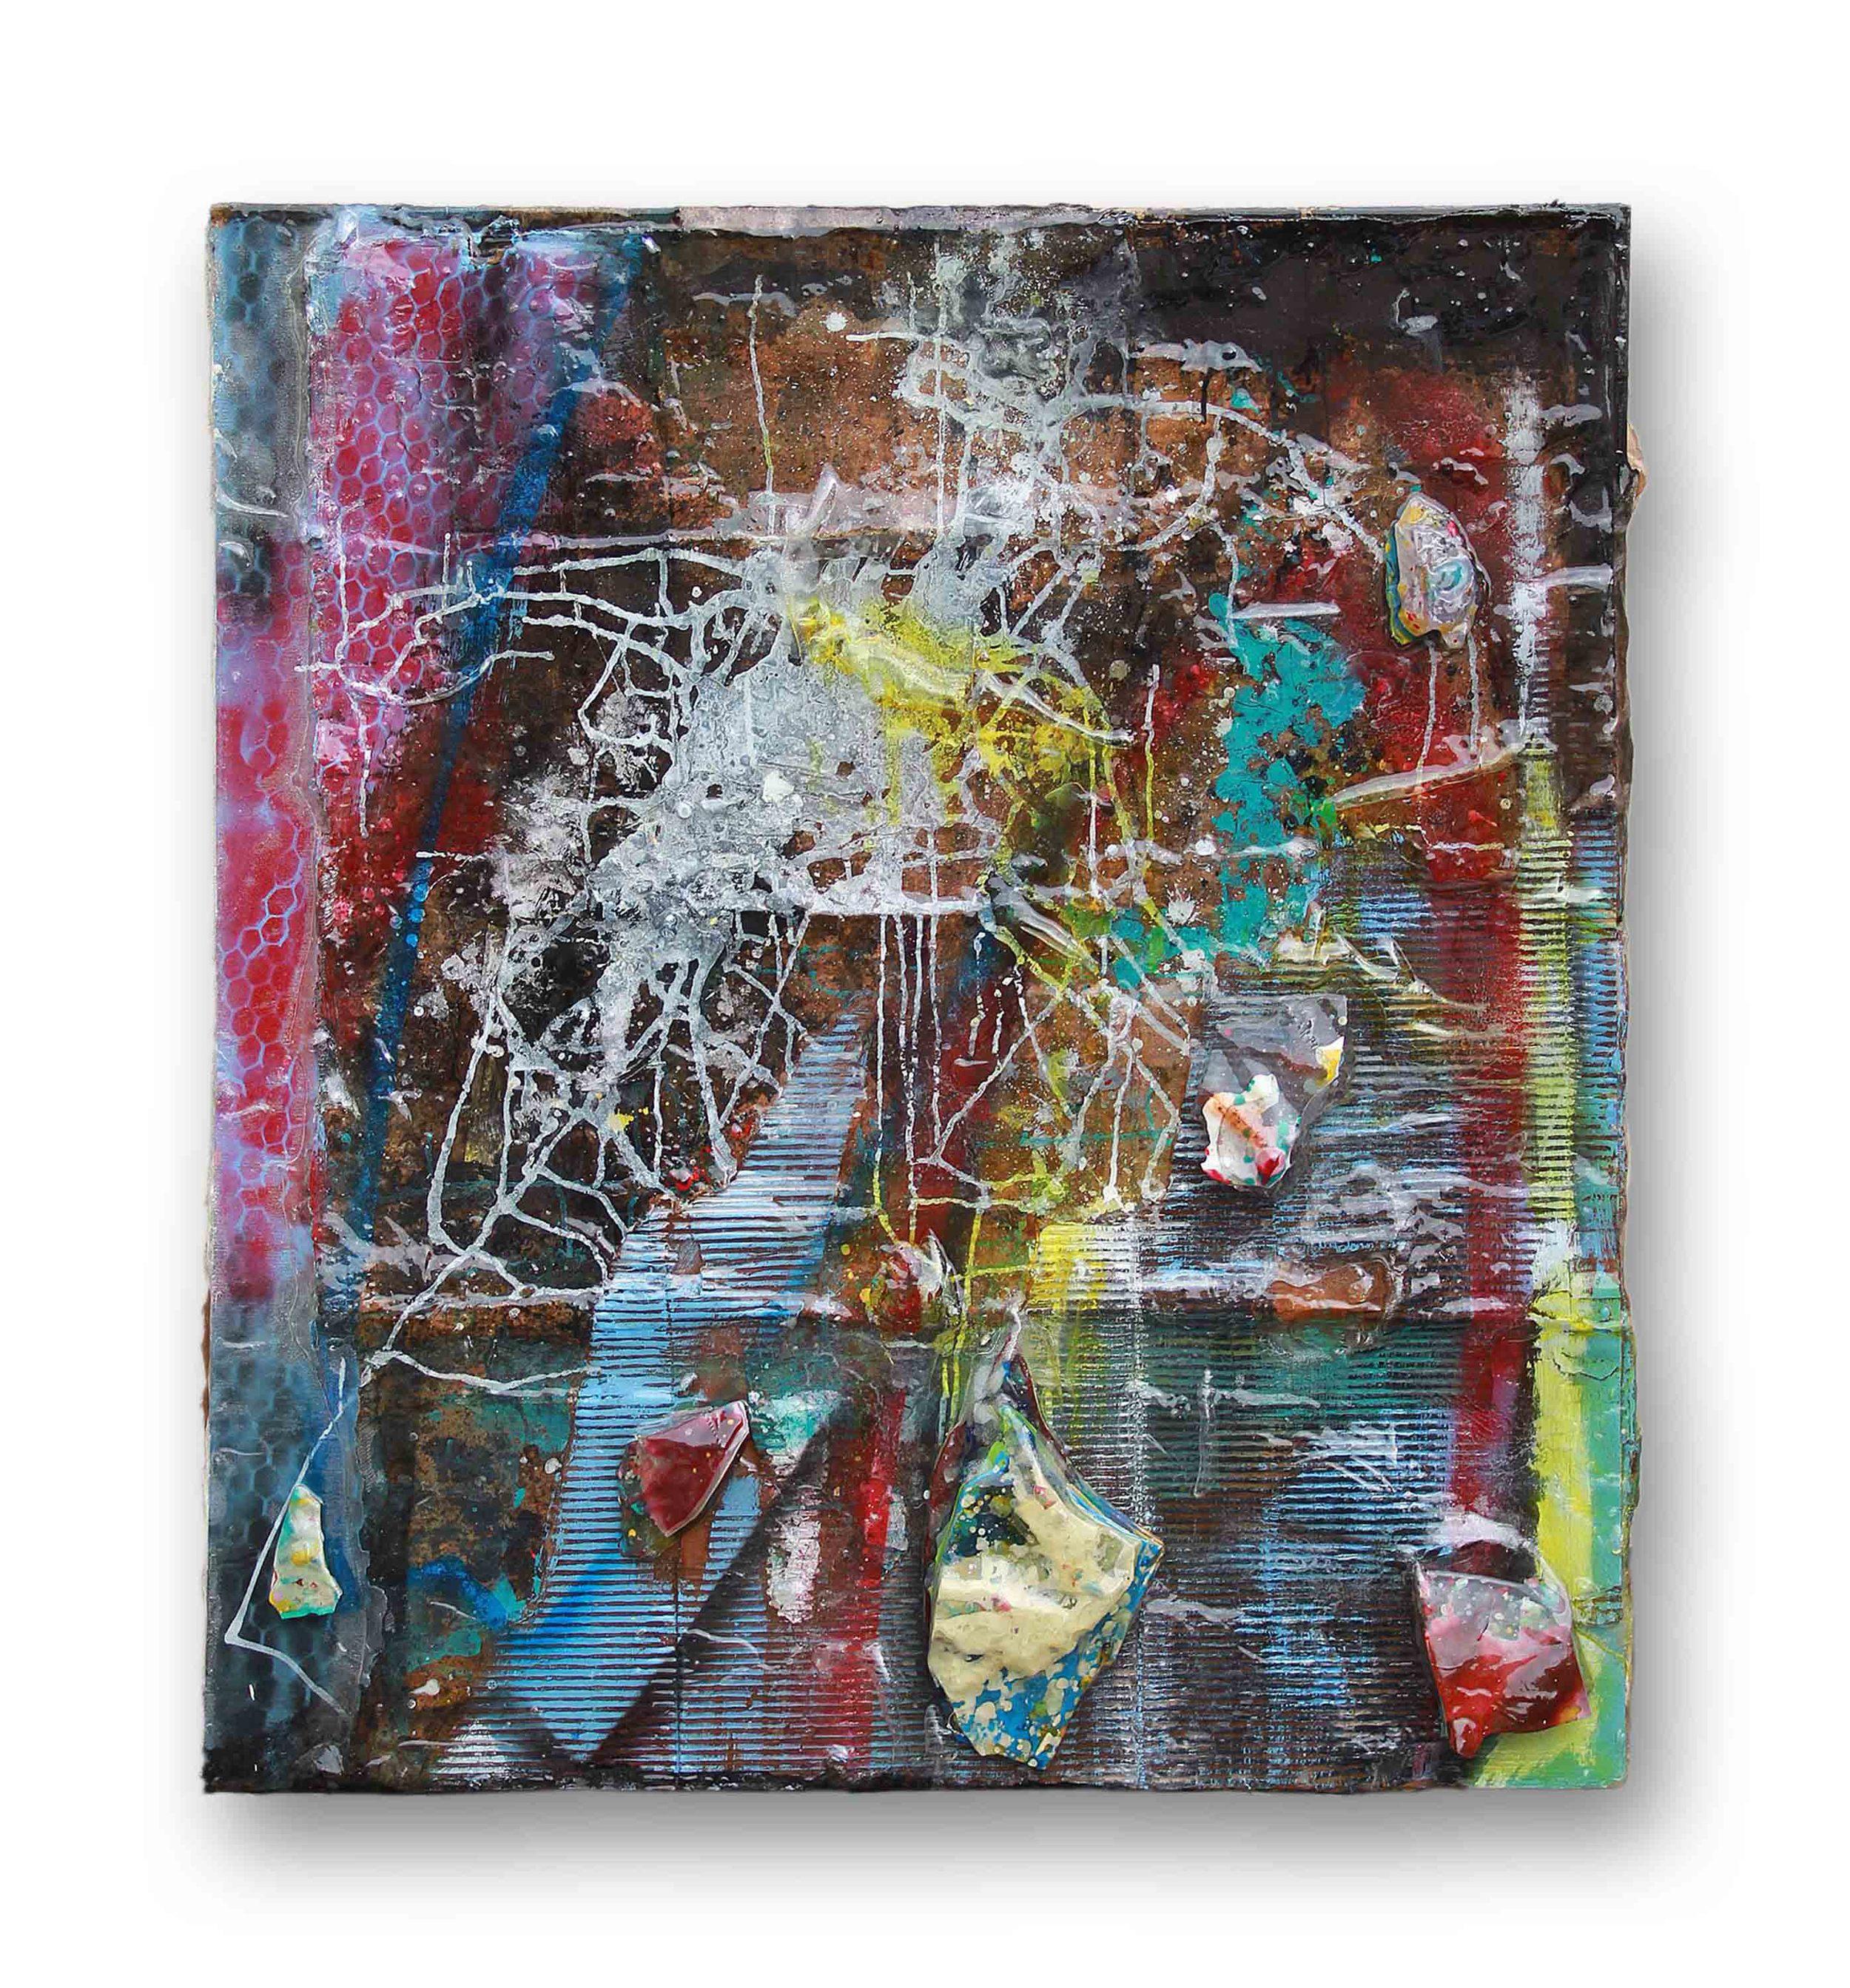 24 Resin Painting CC IMG_9052 03 LR.jpg